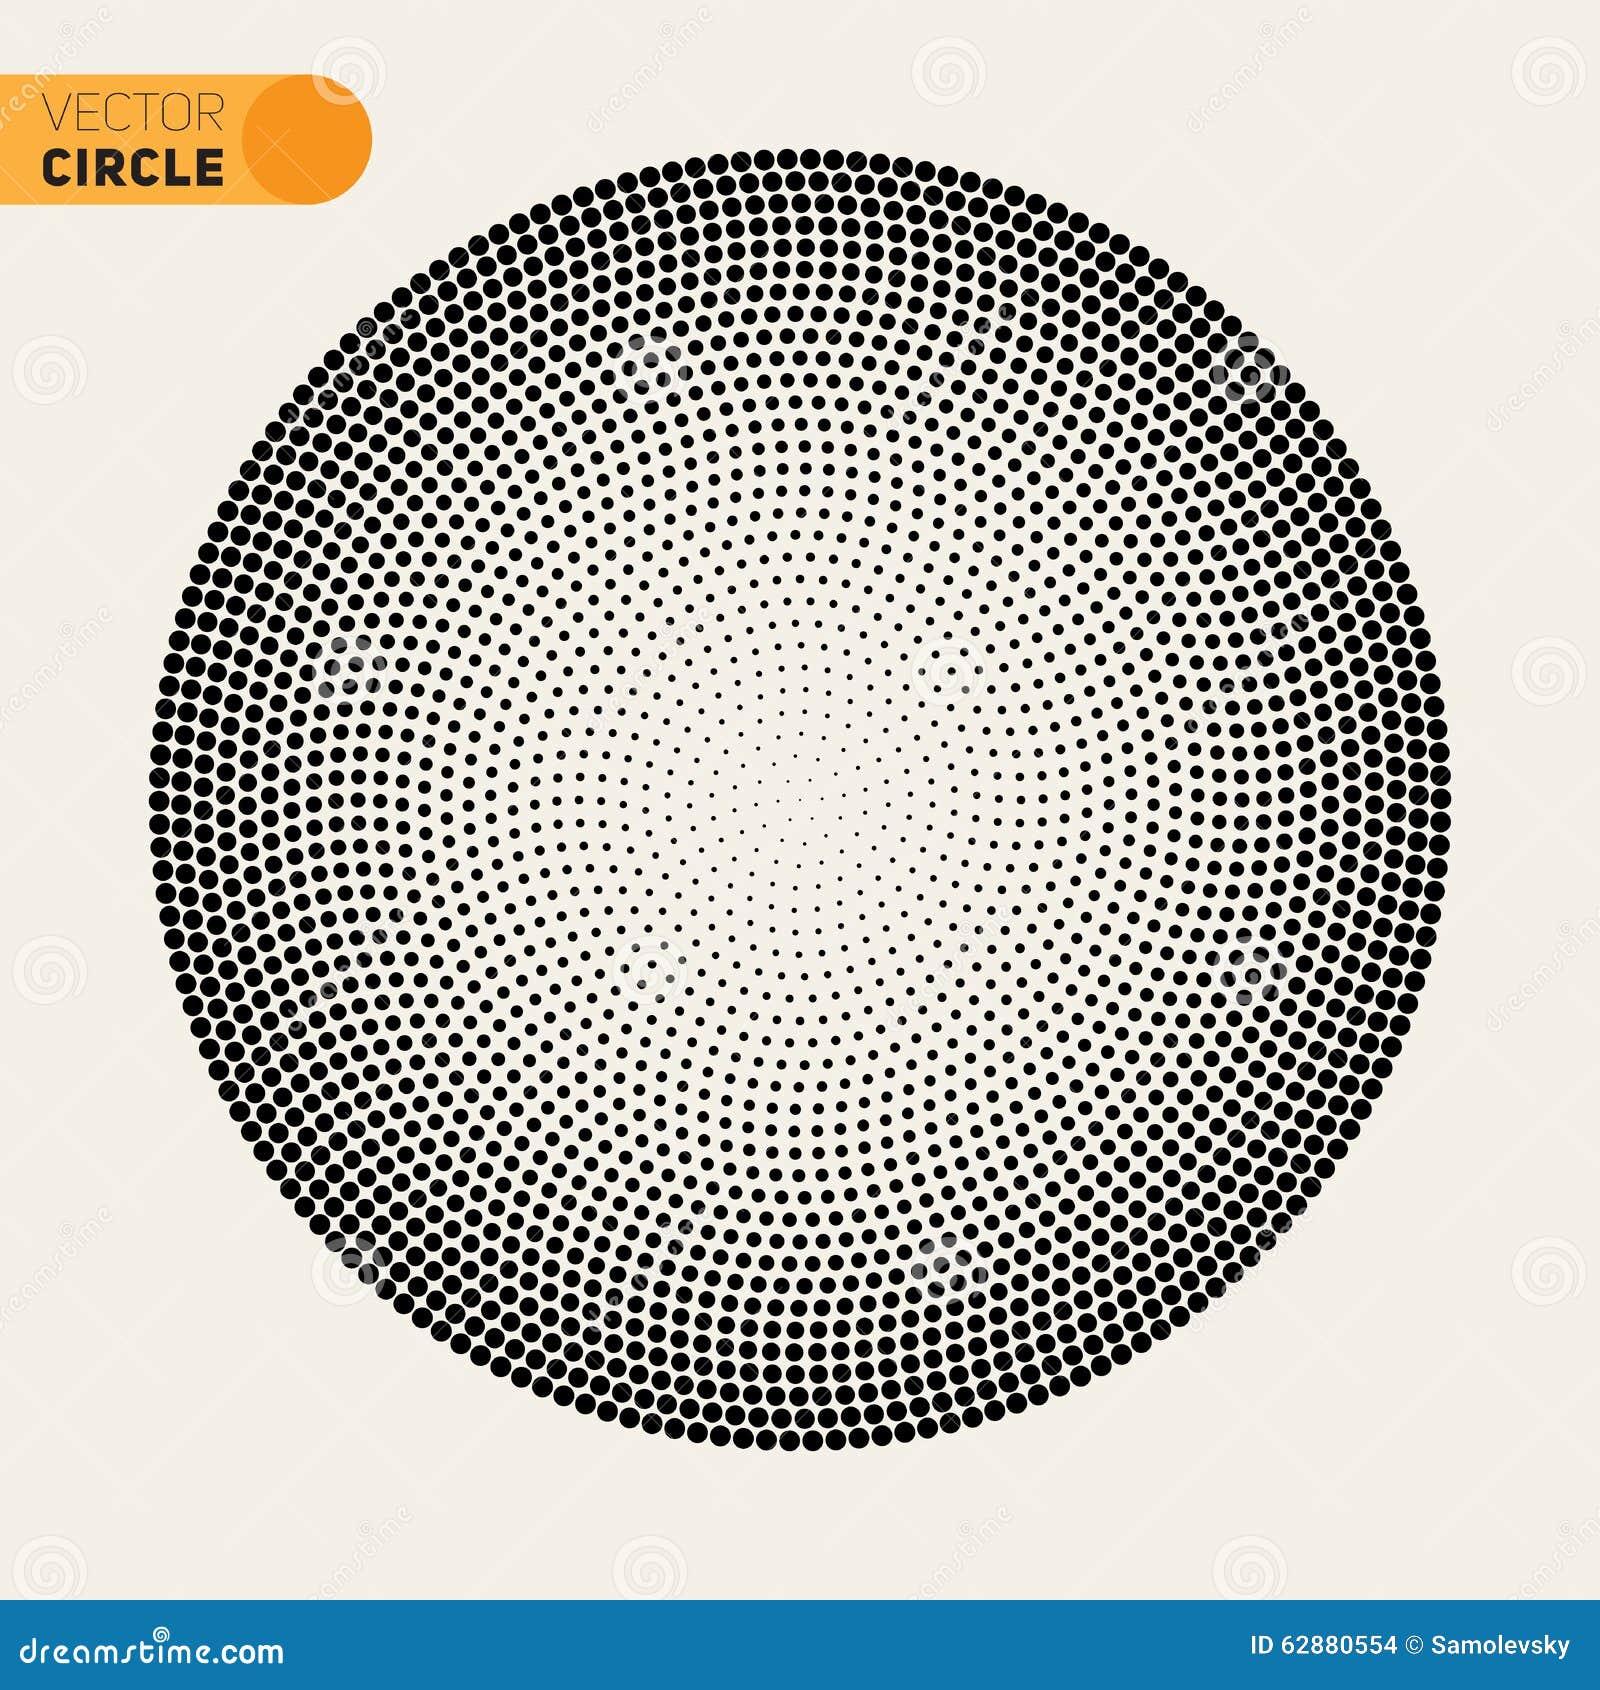 how to make the fibonacci sprial